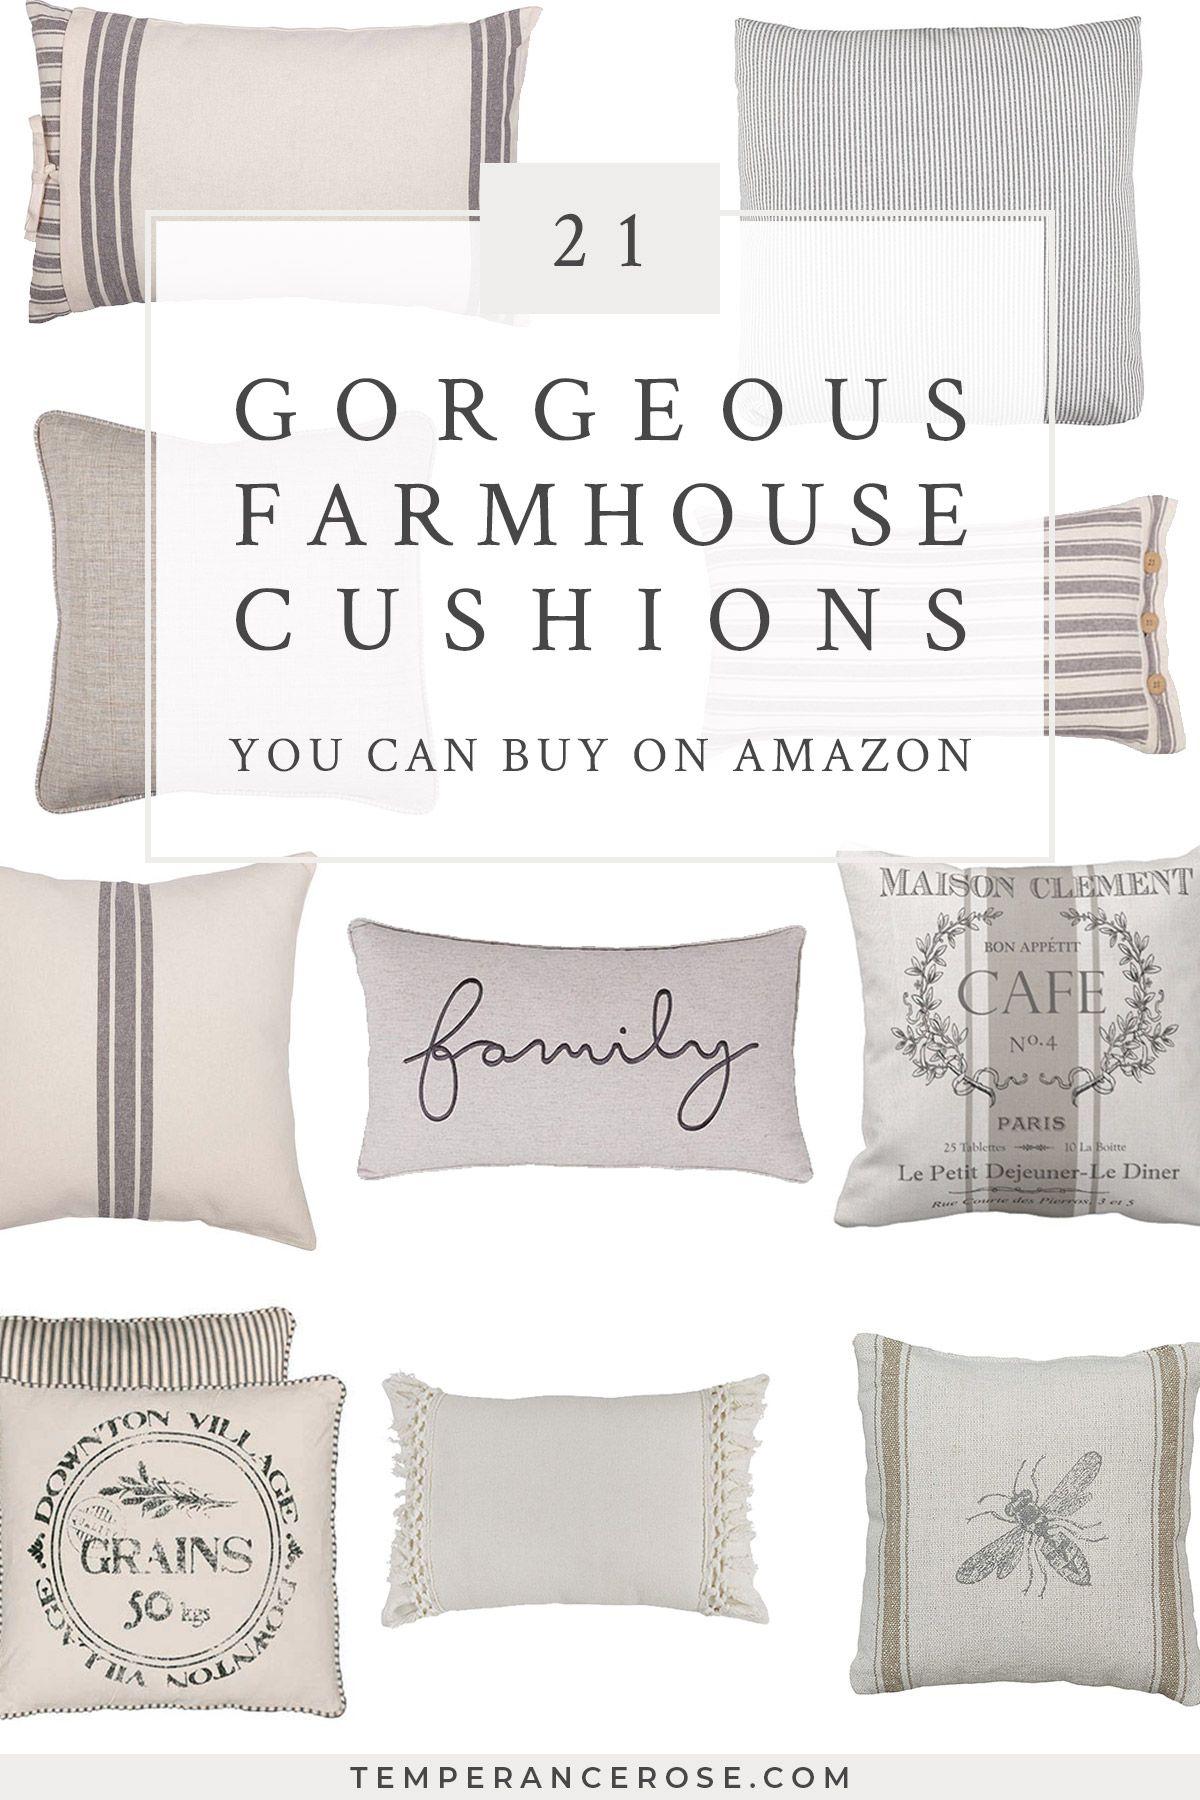 Farmhouse Large Throw Pillow Black White Floral Design Country Cottage